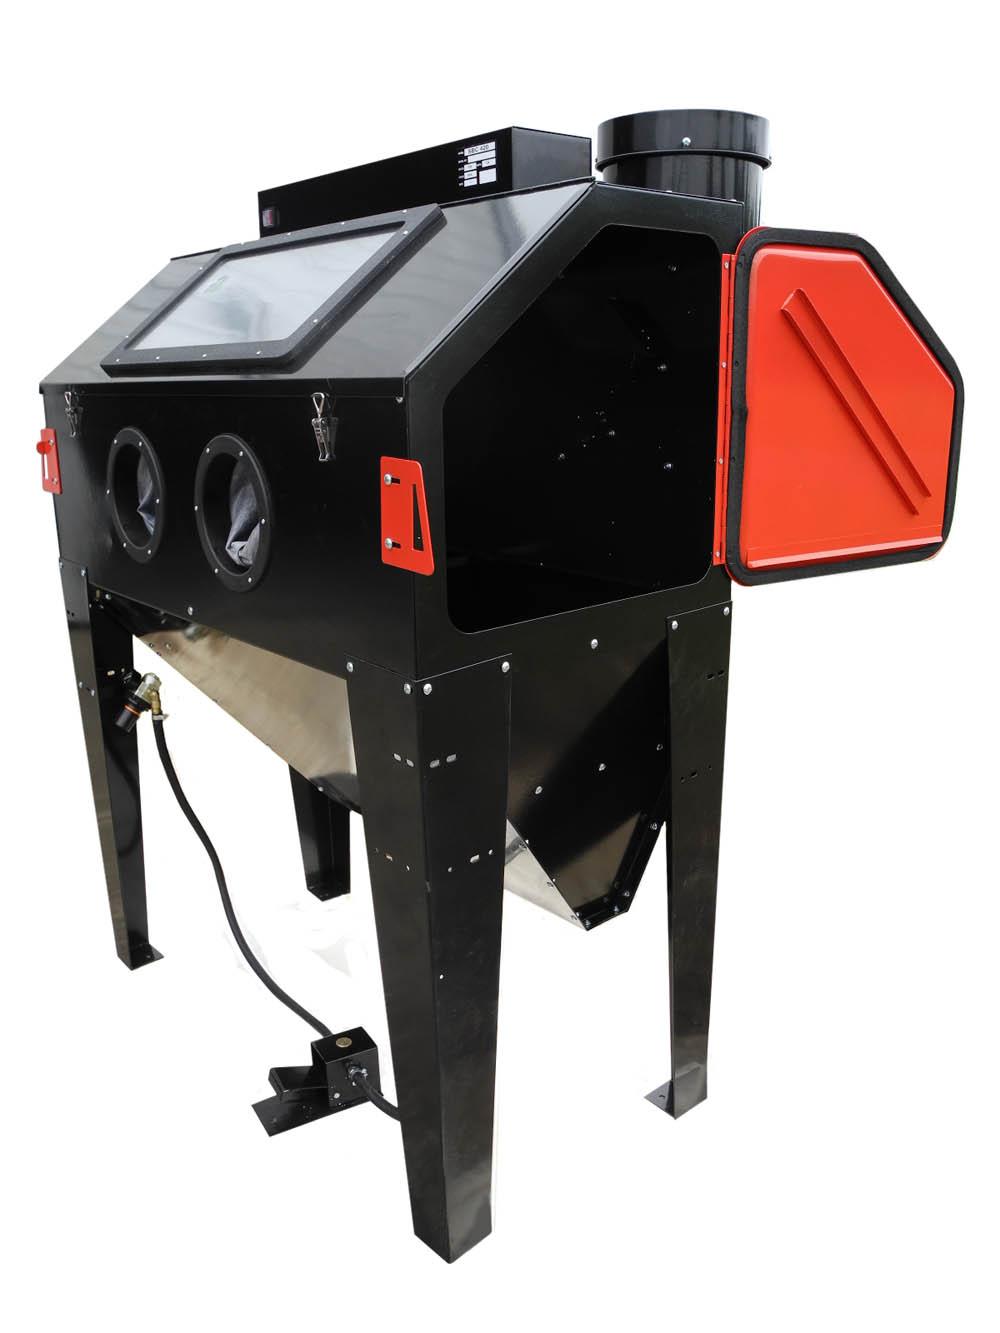 Abrasive Blasting Cabinet New Redline Re48 Elite Series Abrasive Sand Blaster Cabinet Glass